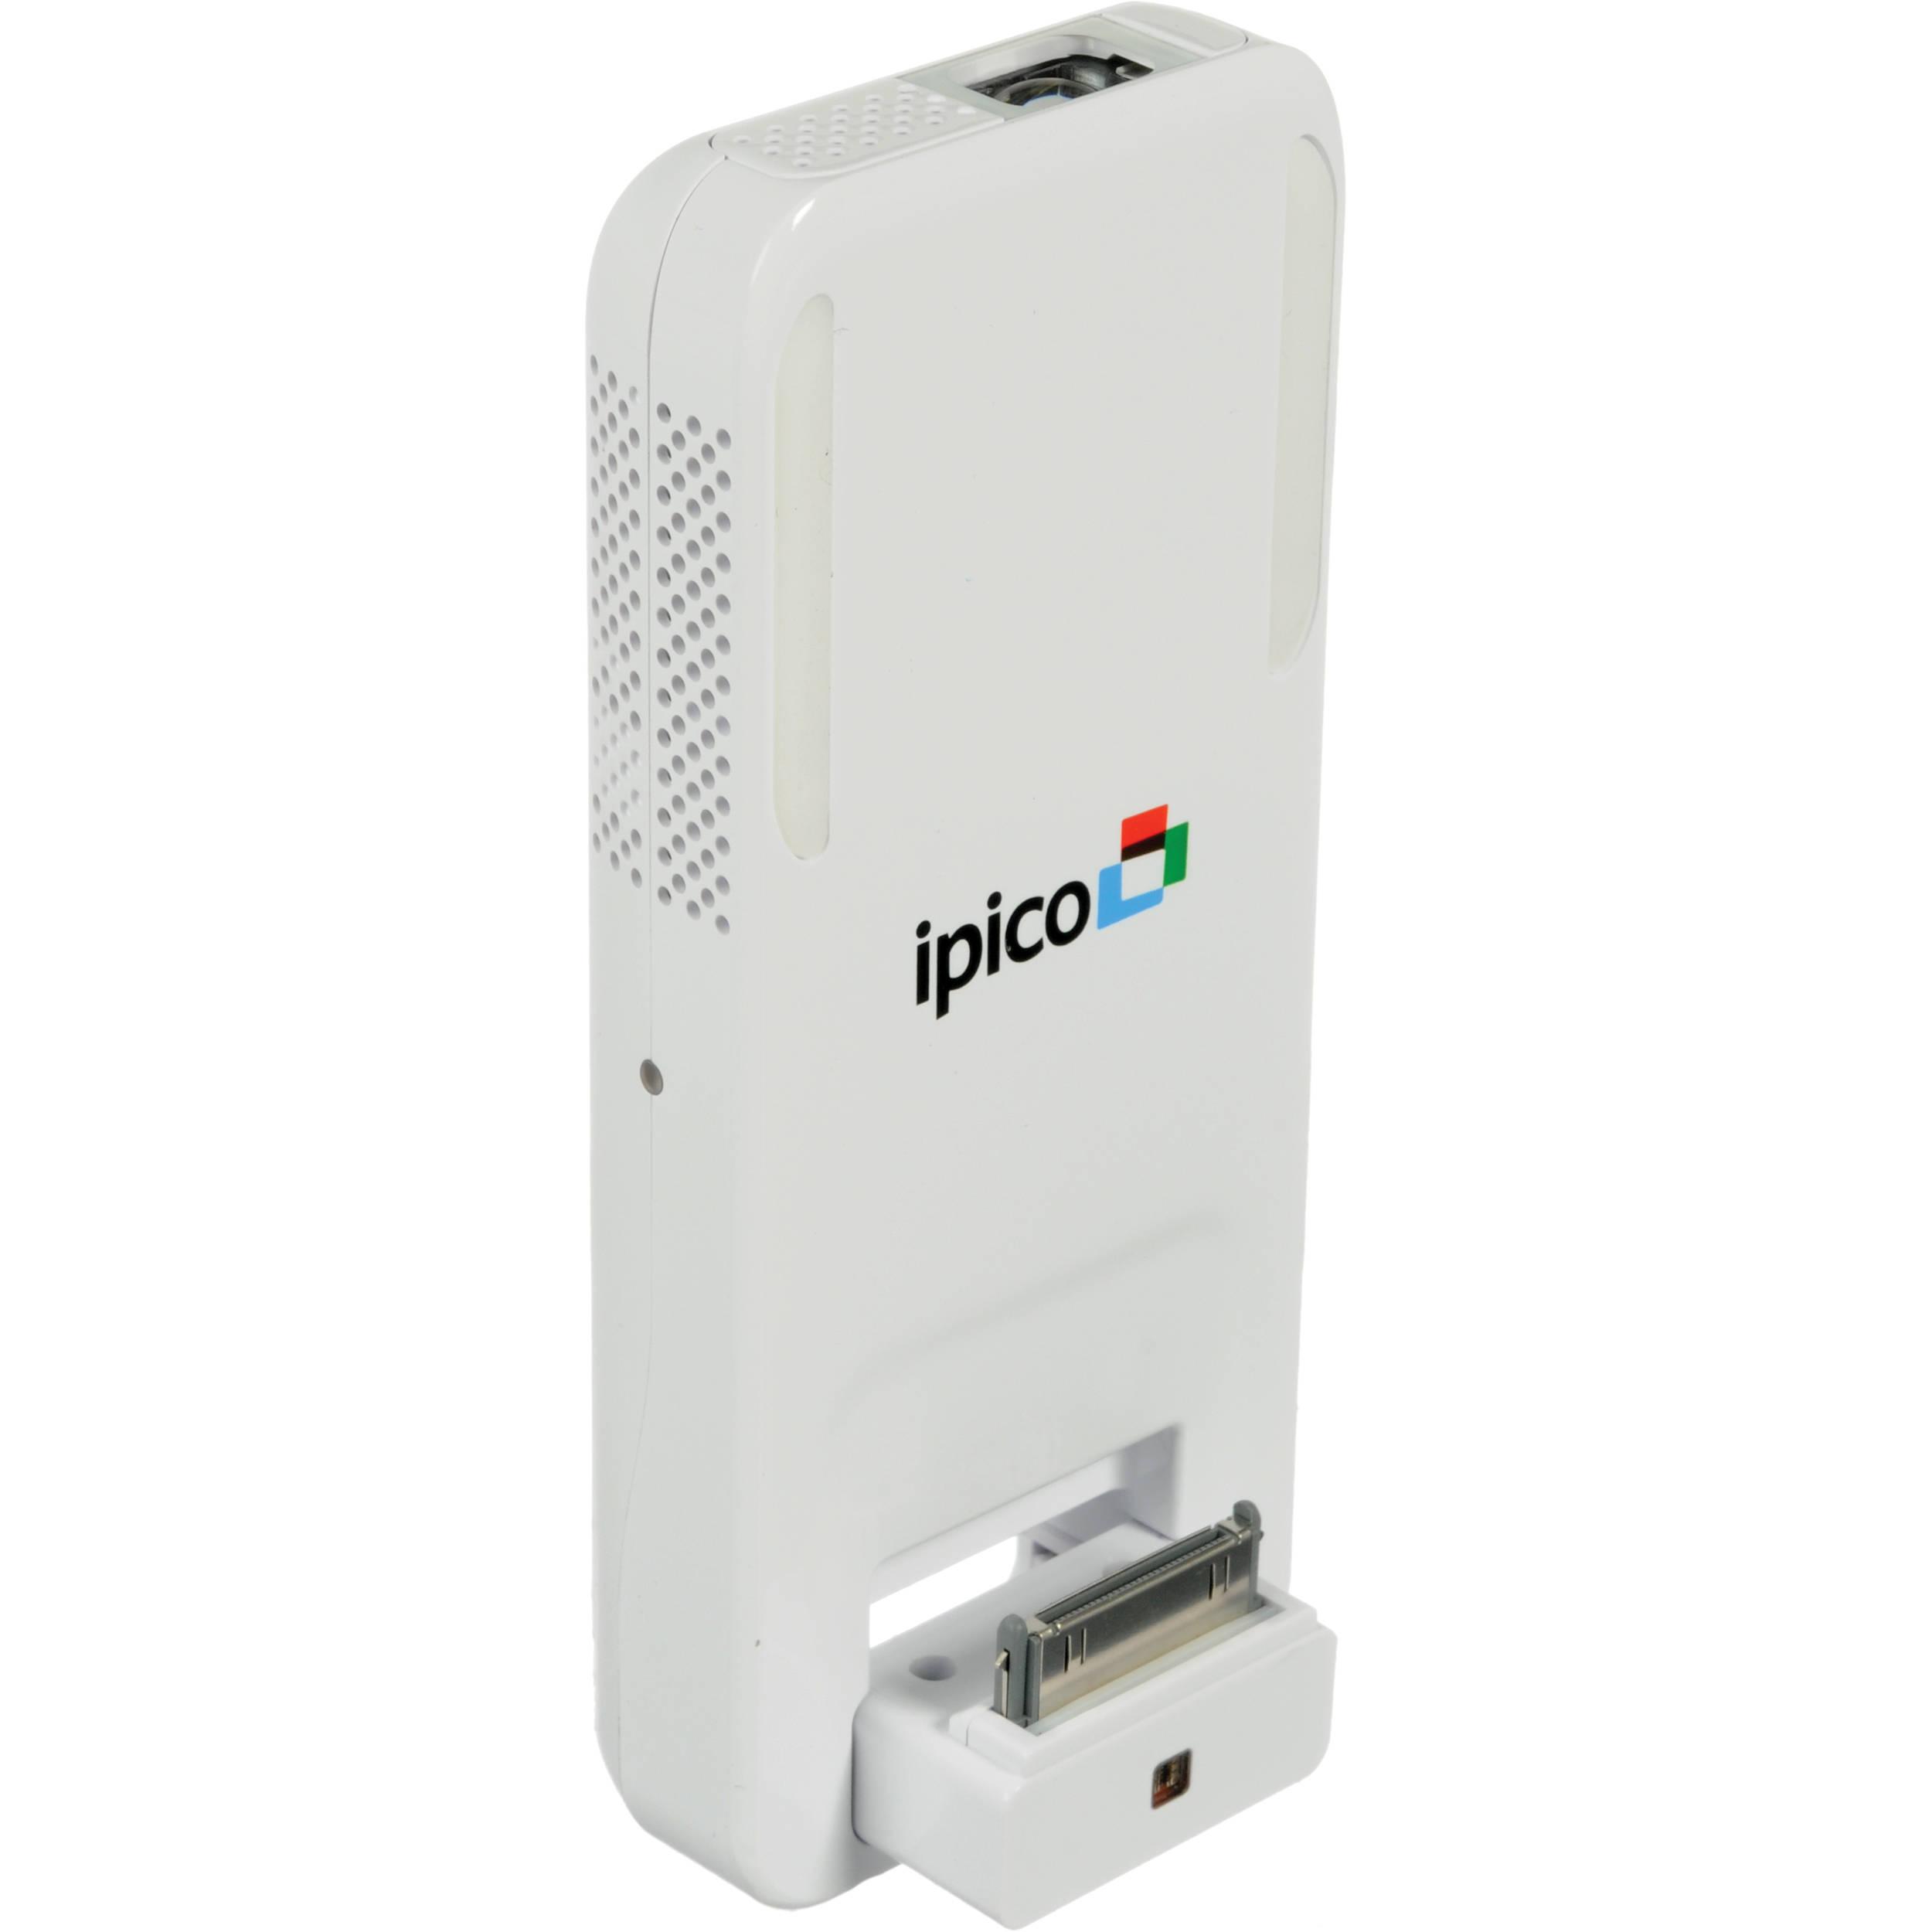 General imaging pj205 ipico hand held projector pj205w1 b h for Handheld projector reviews